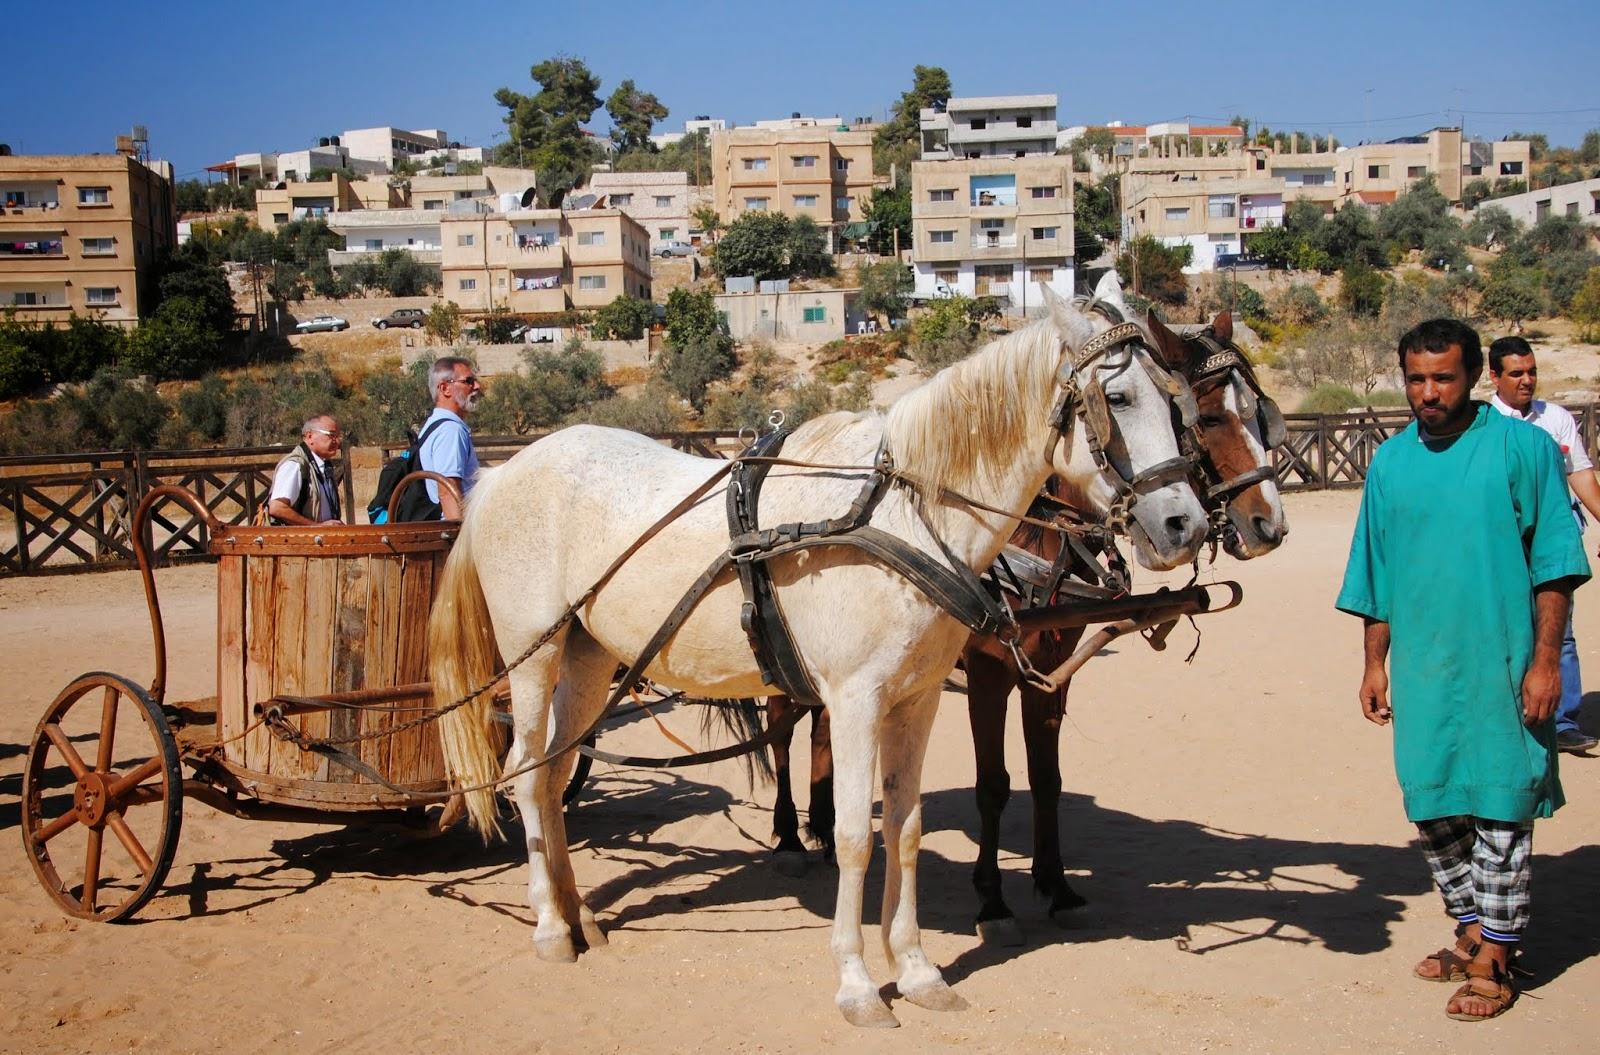 My Photos: Jordan -- Jerash -- Hippodrome